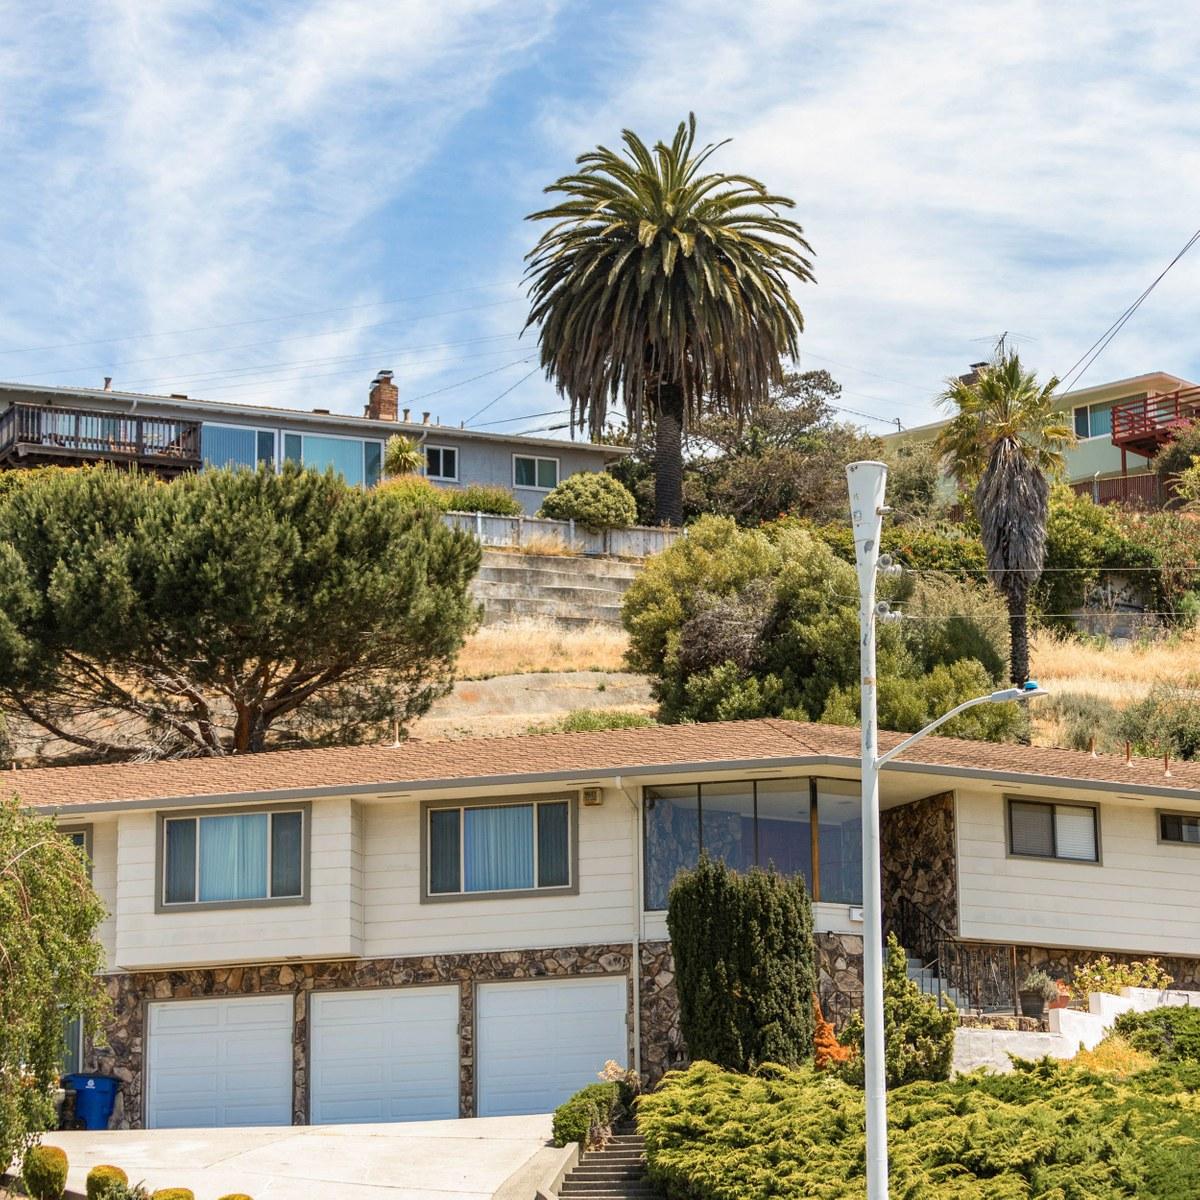 San Leandro Apartments: Bay-O-Vista, San Leandro CA - Neighborhood Guide